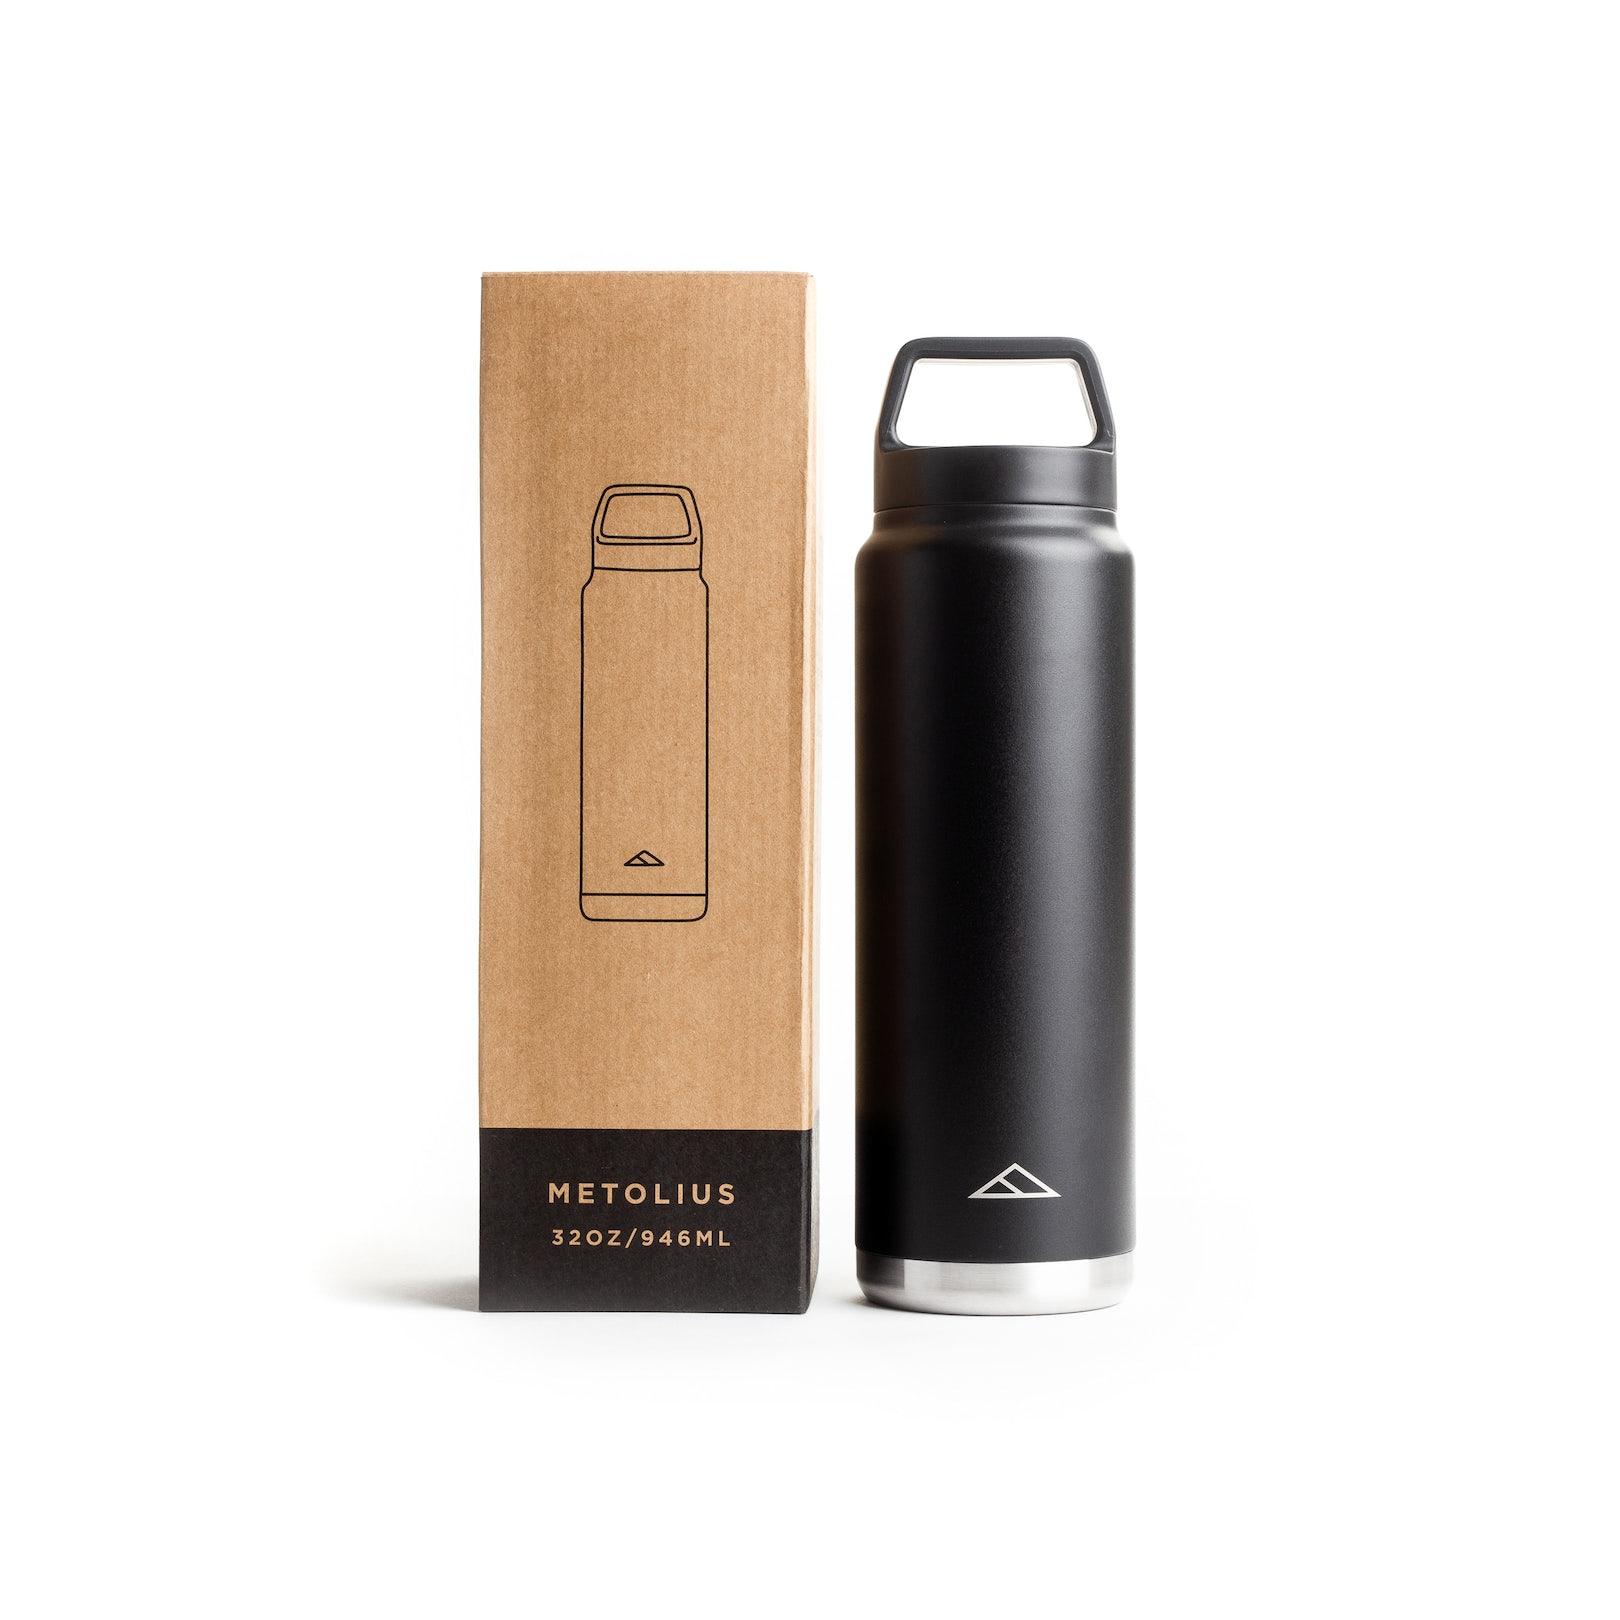 Tillak Metolius Water Bottle